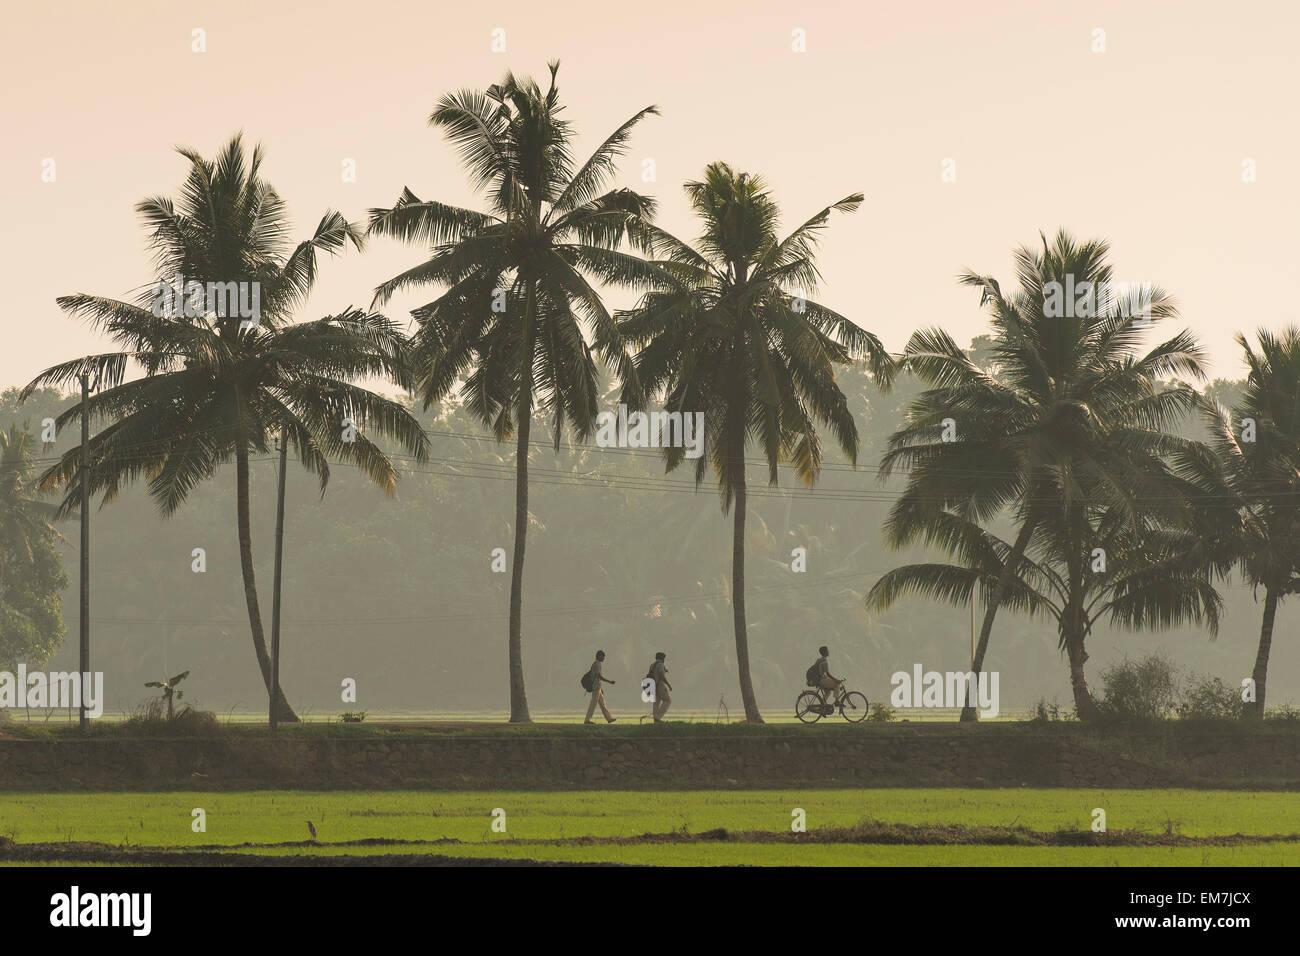 School children on the way home, palm tree avenue, Kerala, Malabar Coast, South India, India - Stock Image